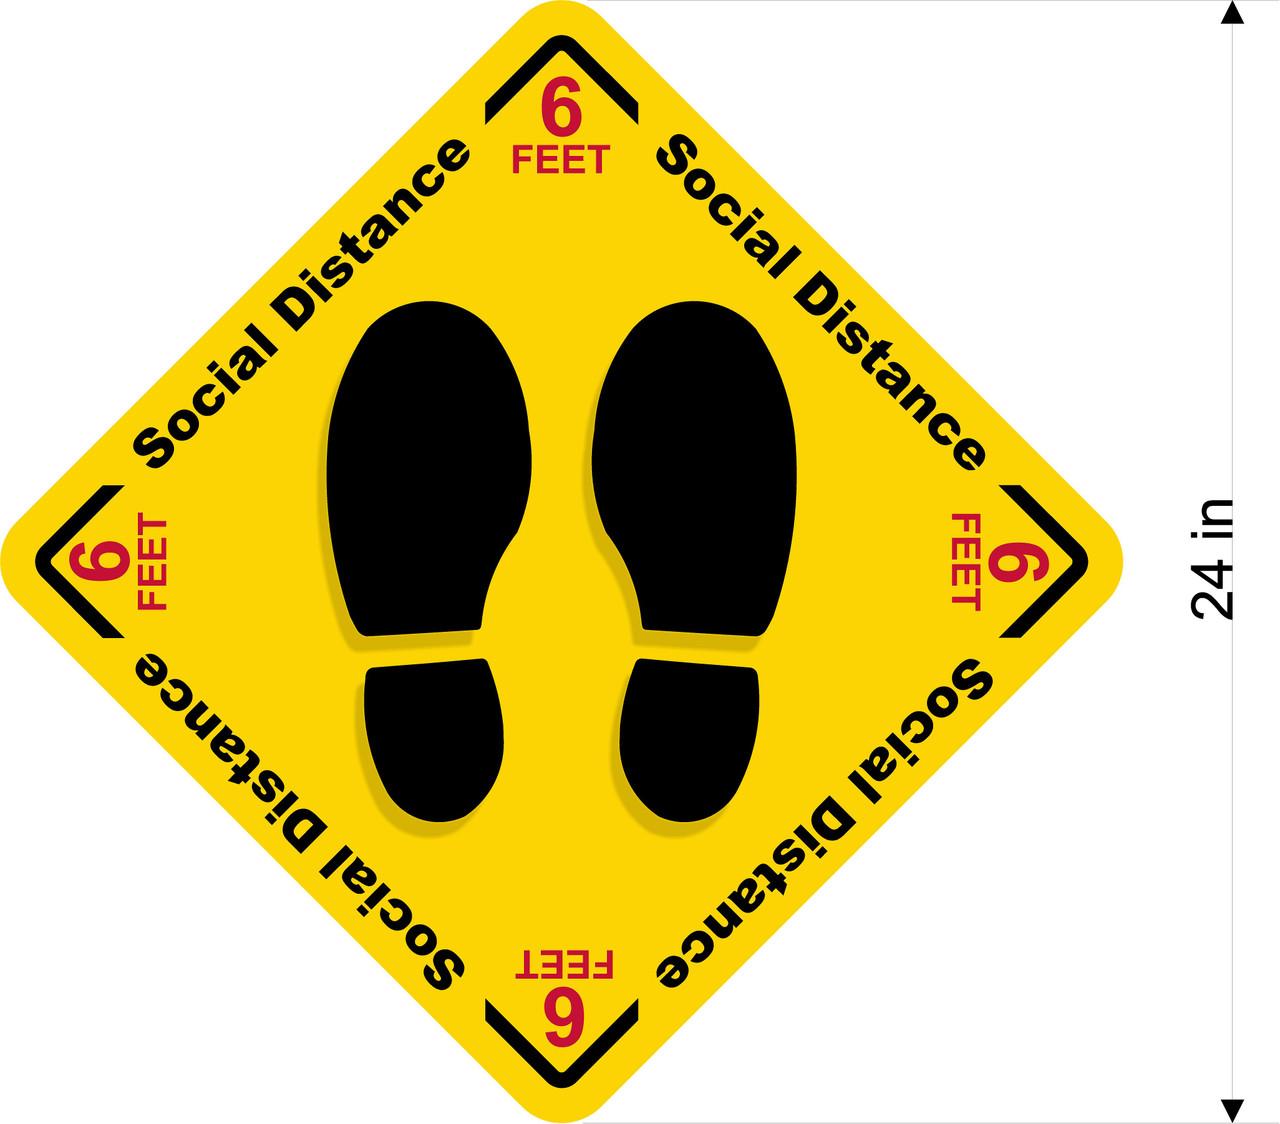 Covid 19 Social Distance Floor Decal - Sticker